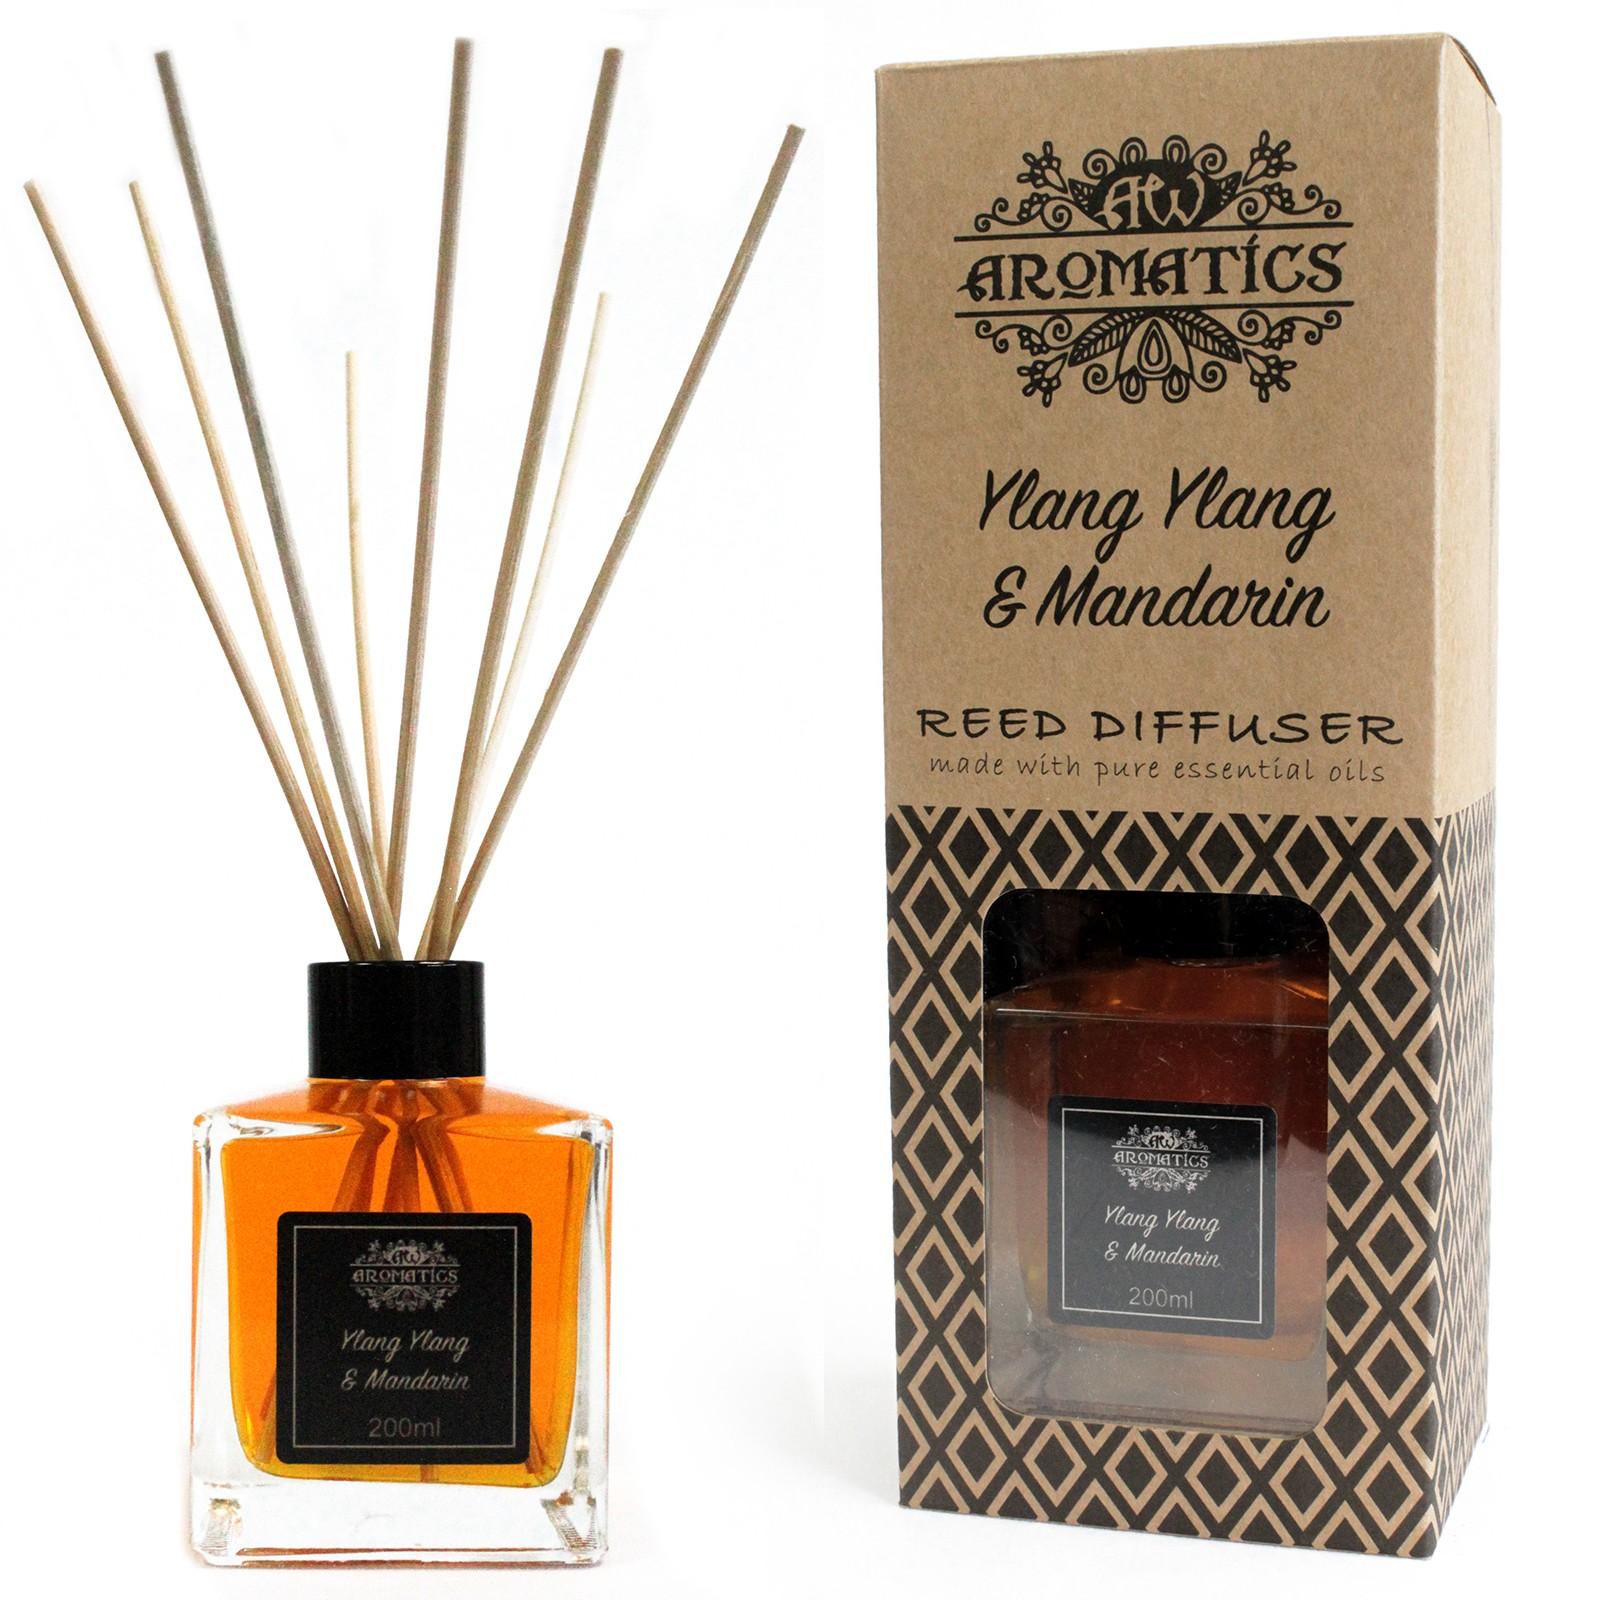 200ml Ylang Ylang and Mandarin Essential Oil Reed Diffuser